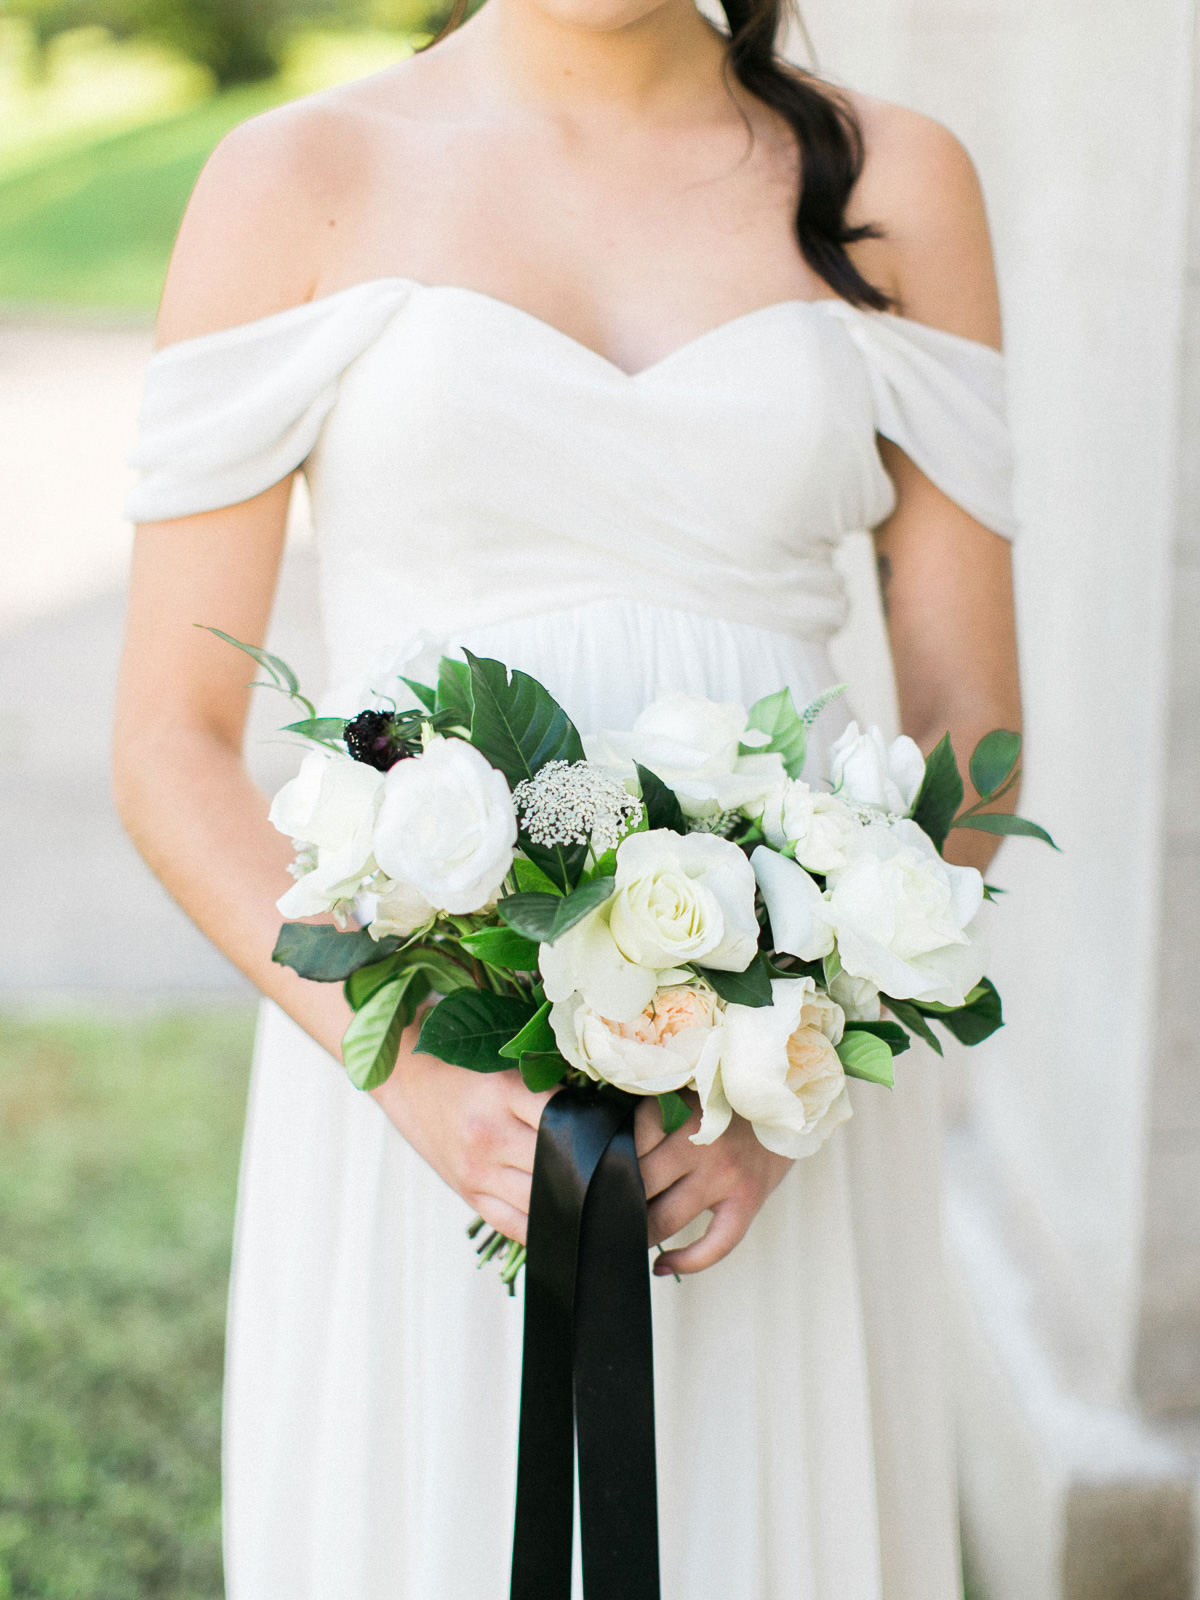 kurtz-orpia-photography-vineyard-bride-swish-list-dundurn-castle-dundas-wedding-editorial-23.jpg